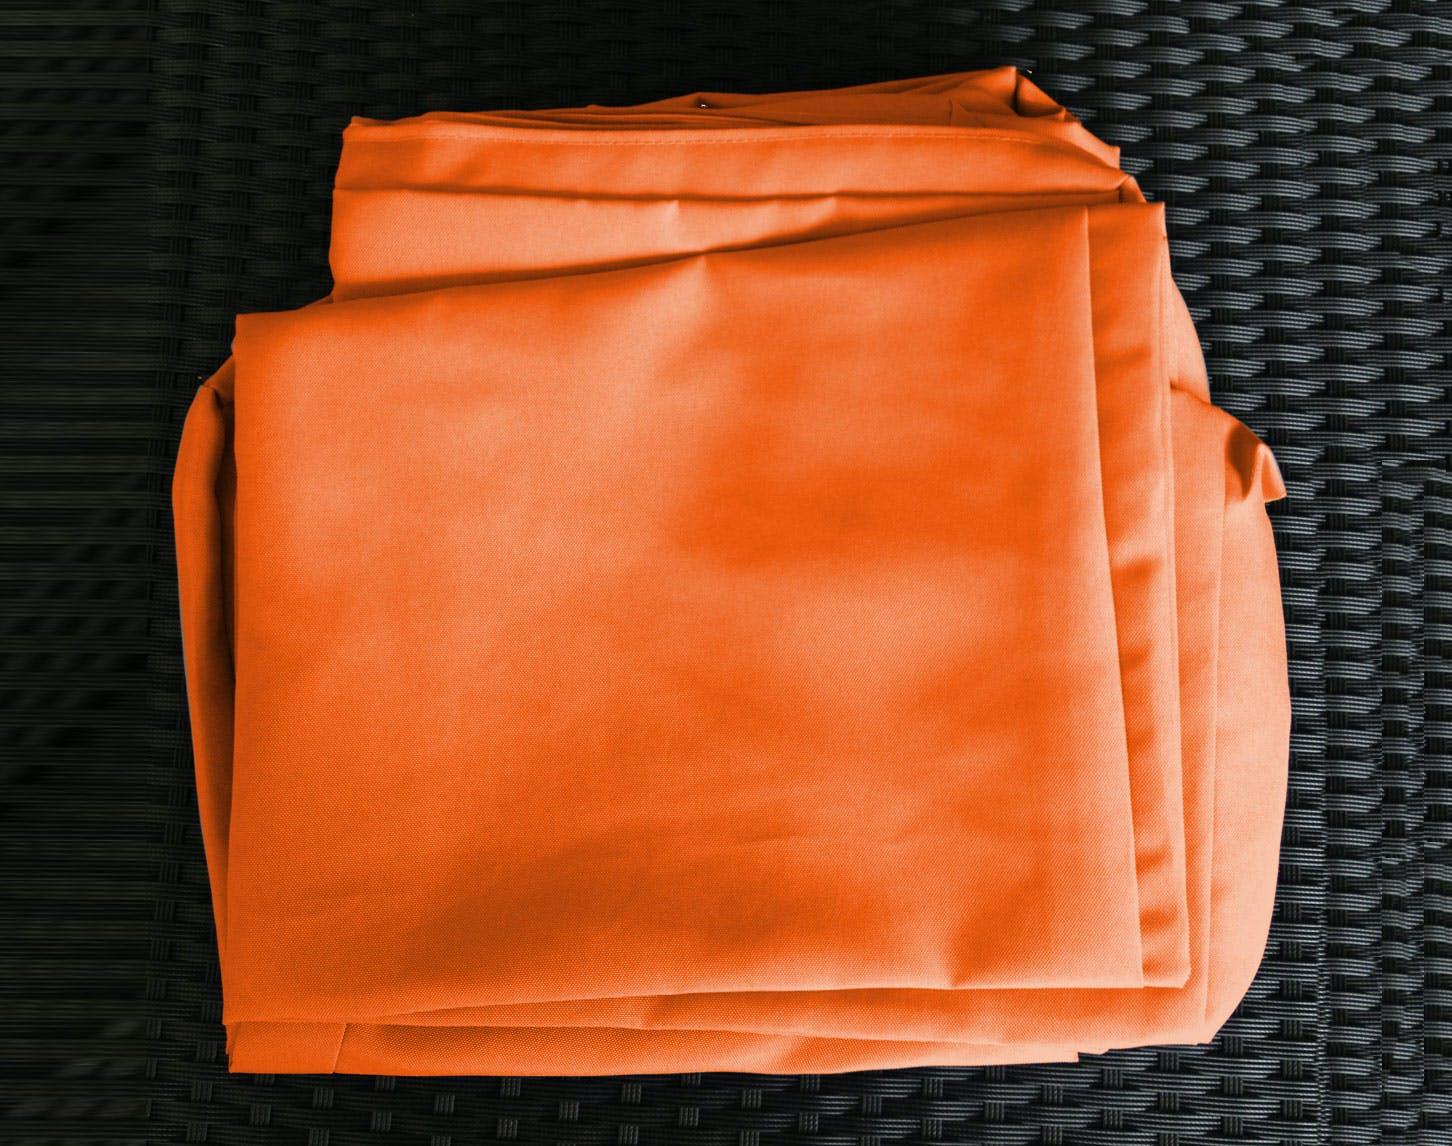 Jeu de Housses tissu orange pour Salon de Jardin COPACABANA